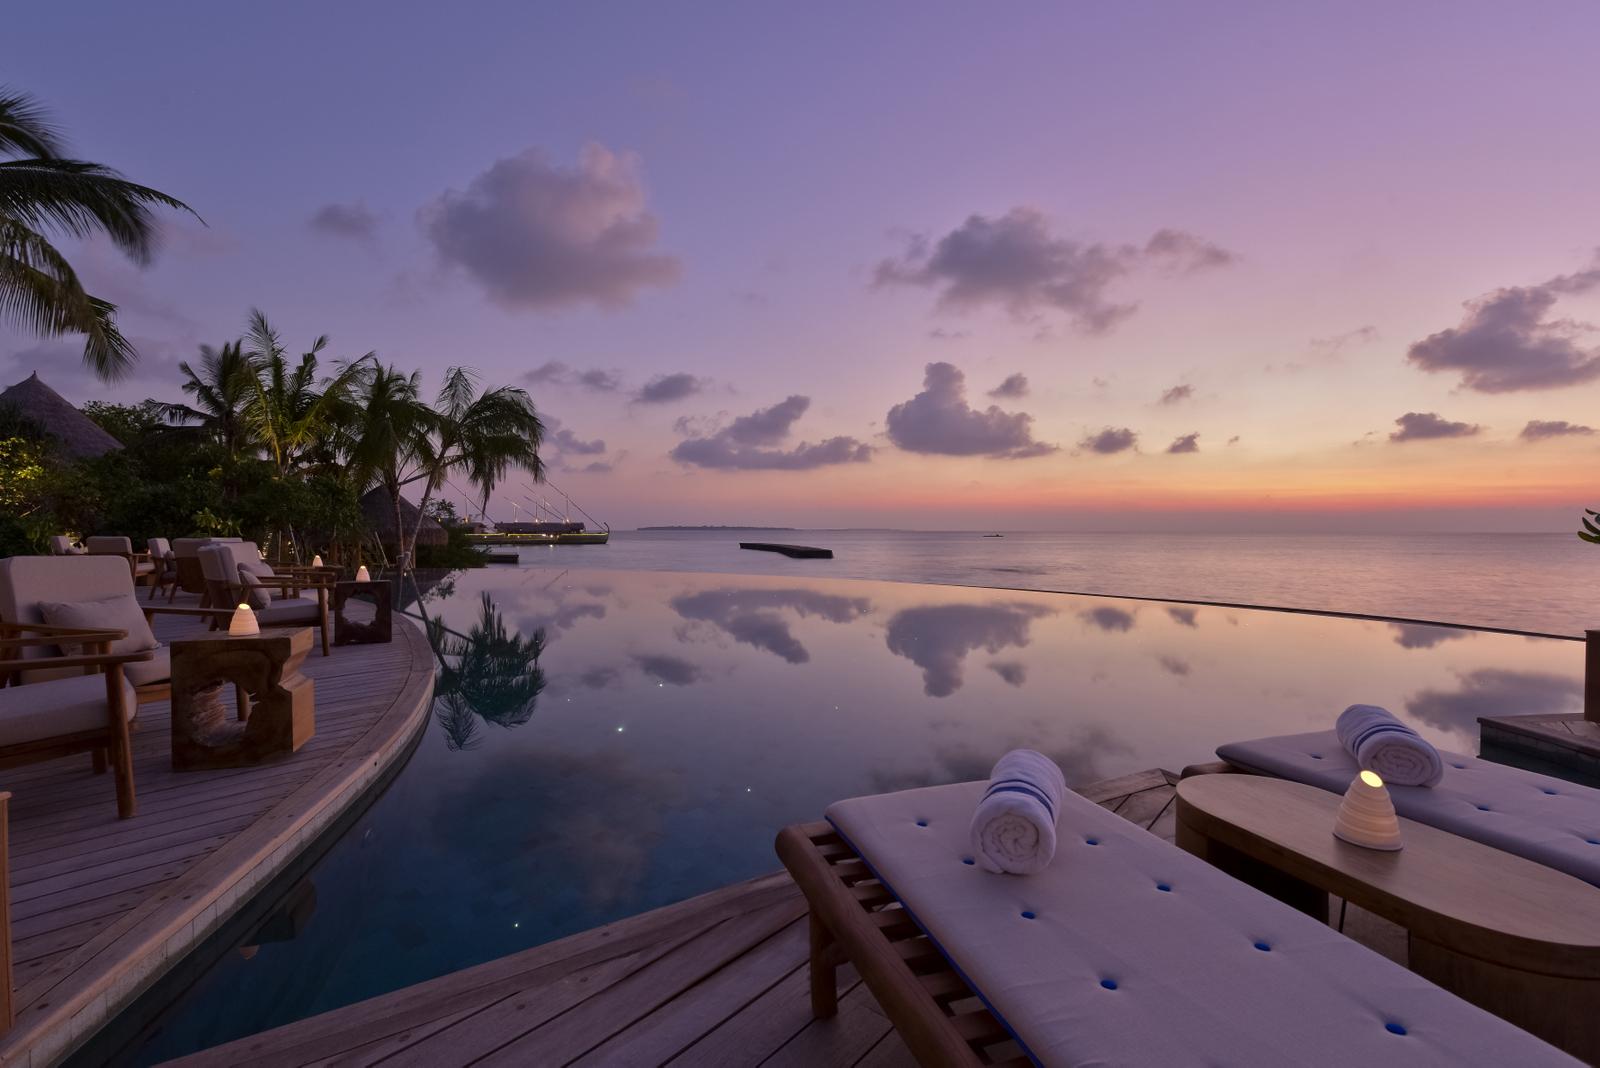 Malediven    die neue Trauminsel Milaidhoo im Baa Atoll strand sonne reisebericht malediven honeymoon 2  Milaidhoo Maldives dining Compass Pool Bar 8